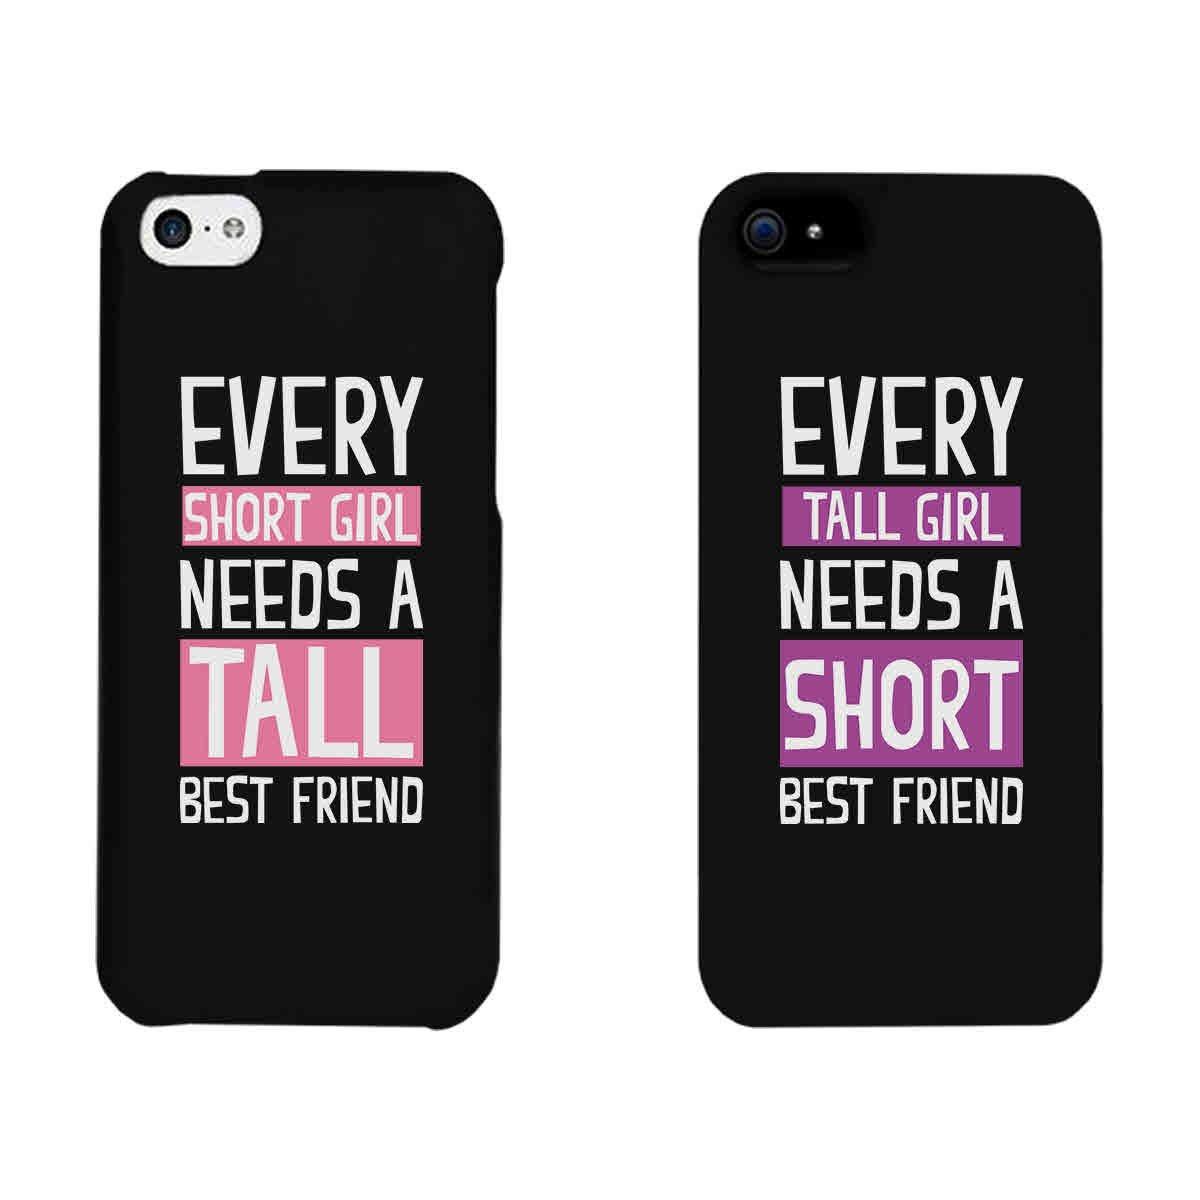 Amazon.com: 365 Printing Every Short Girl and Tall Girl Black ...